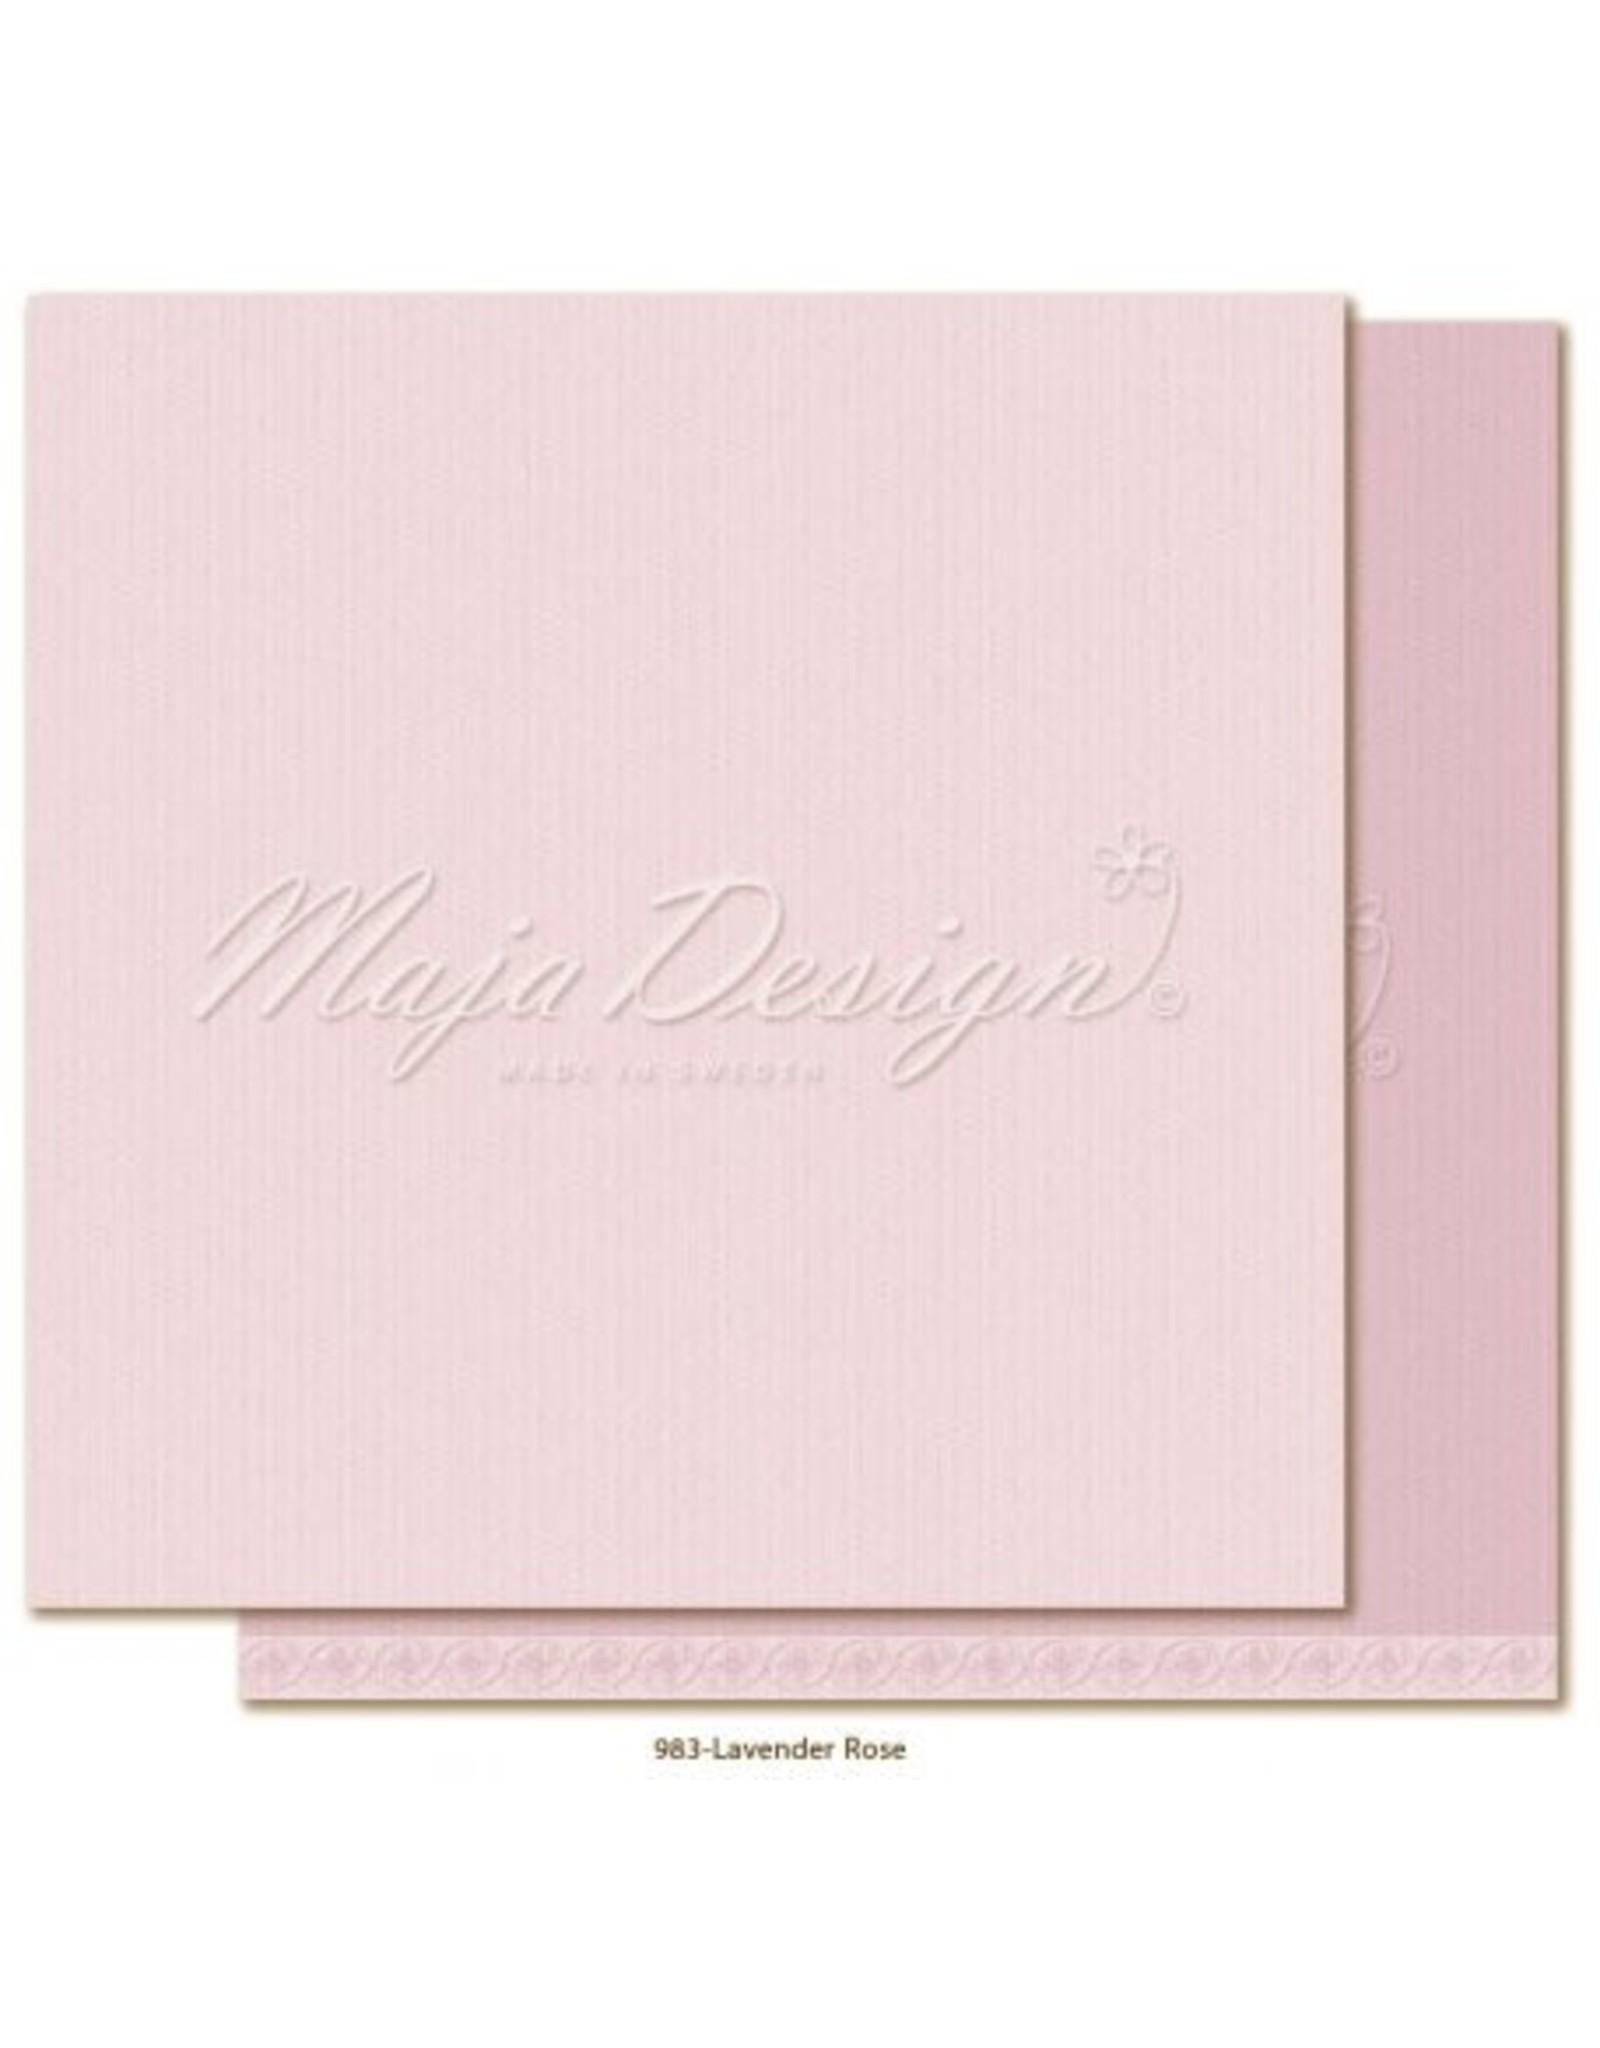 Maja Design Maja Design Monochromes Shades of Celebration Lavender Rose